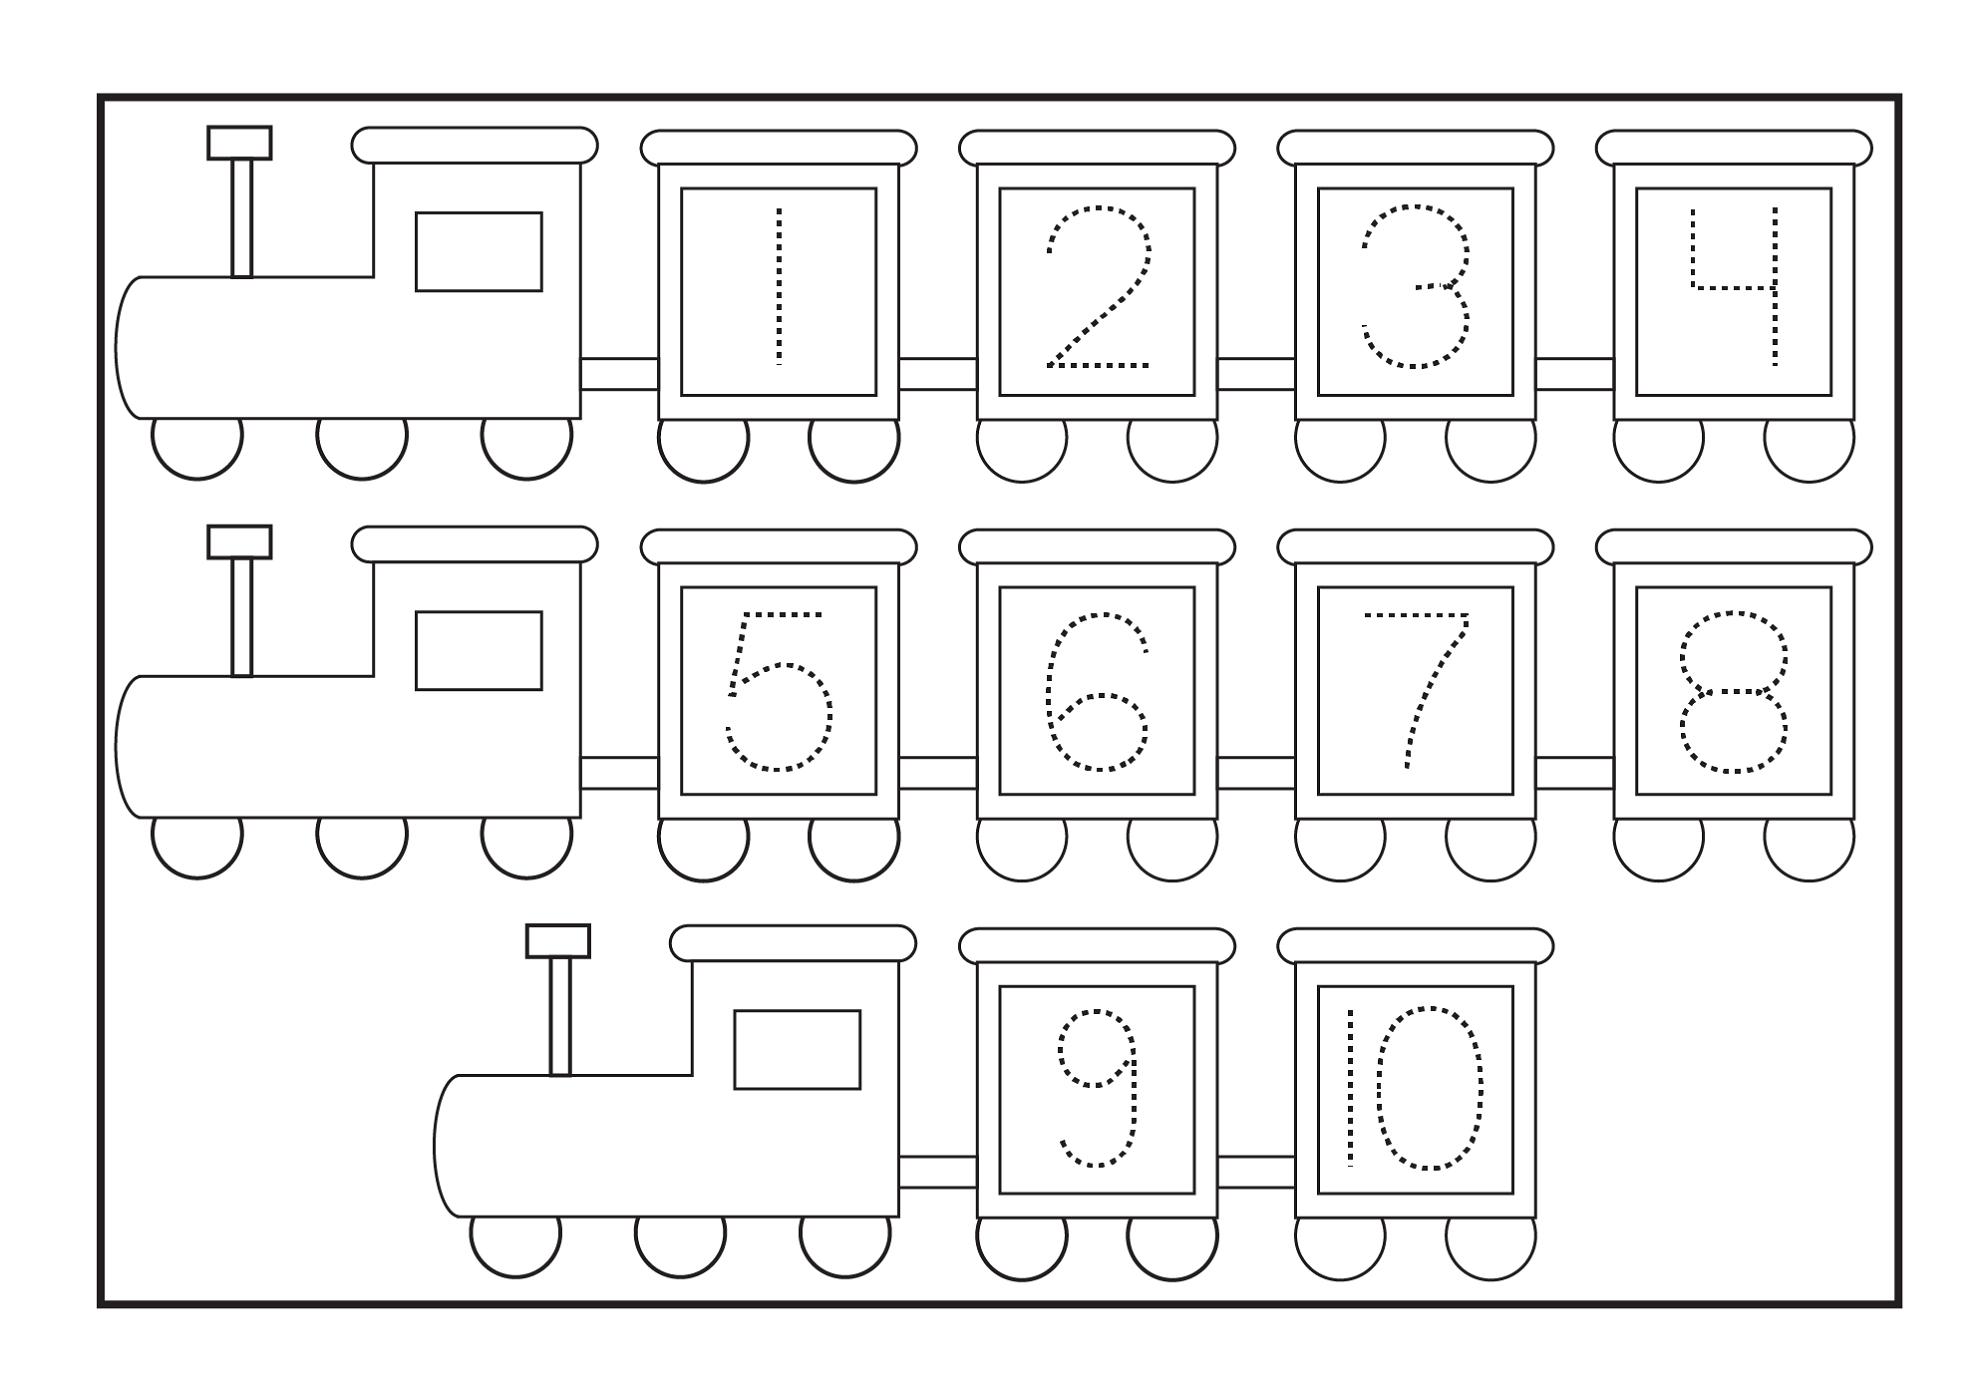 Free Printable Number Tracing Worksheets Number Tracing Girls Wfun